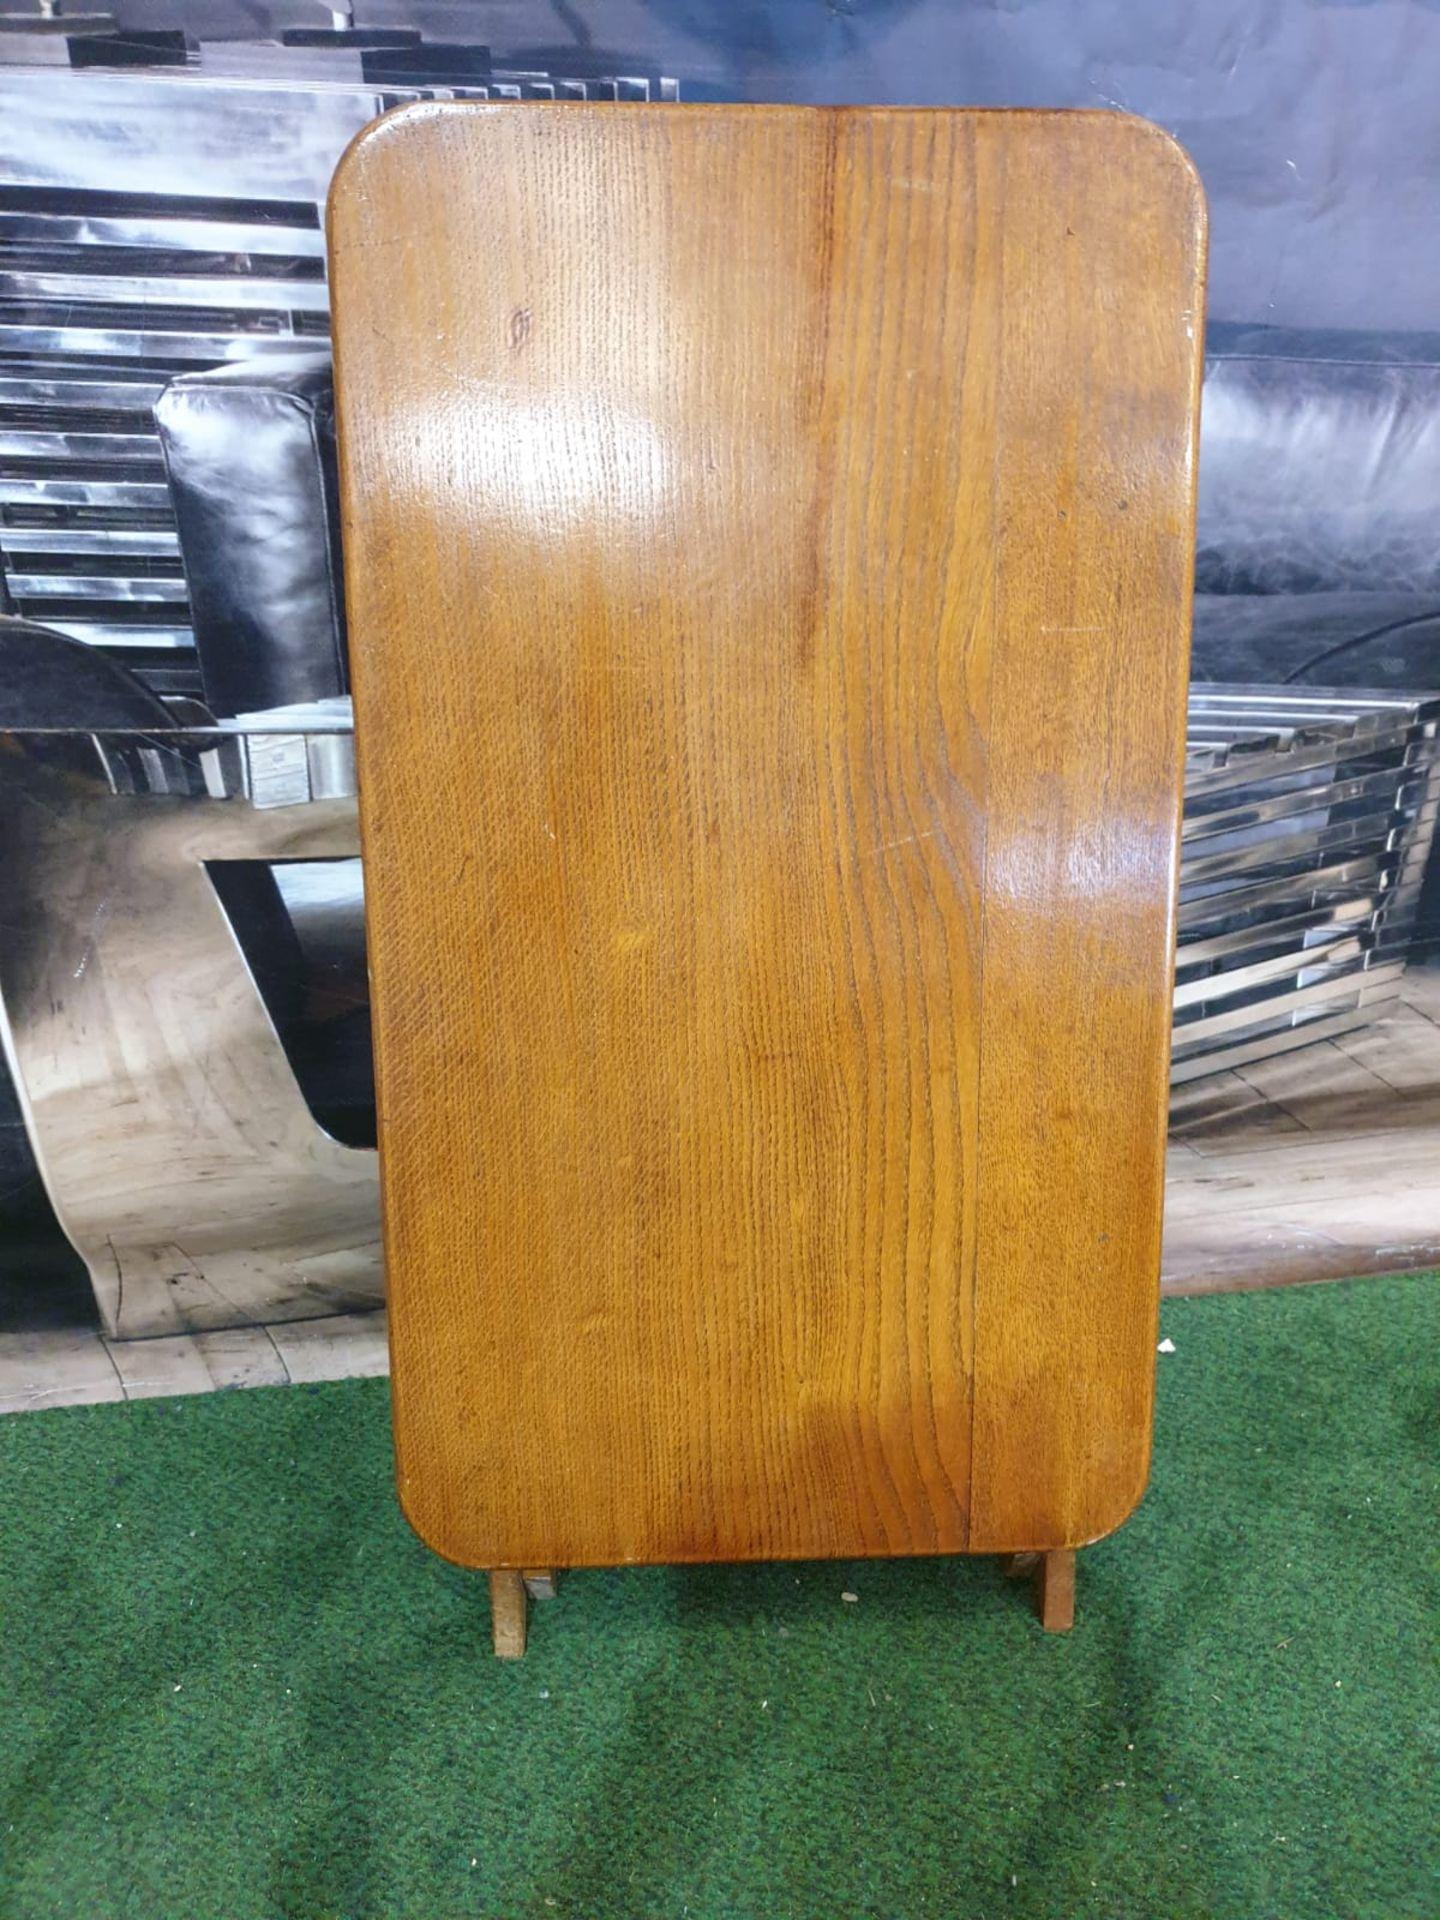 A polished teak folding table 71 x 40 x 4cm - Image 5 of 5